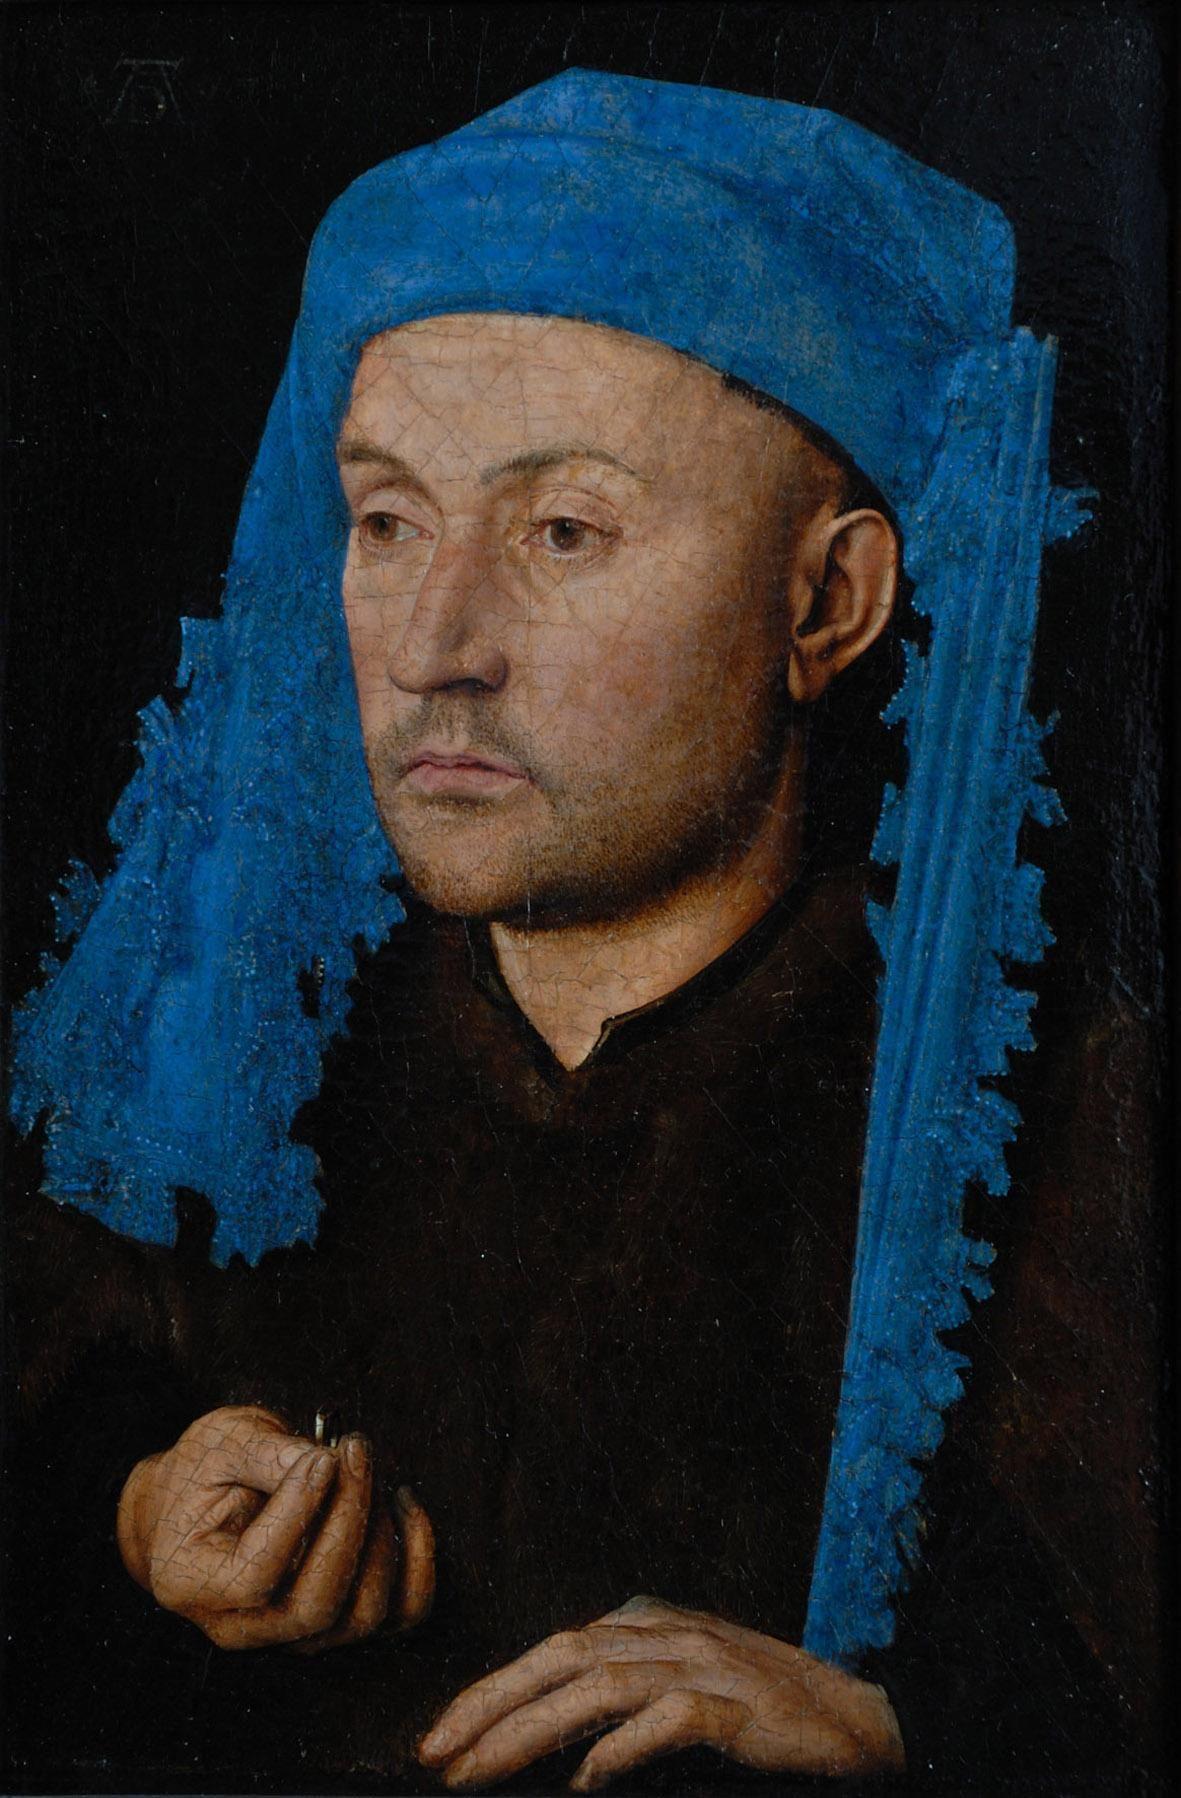 Jan van Eyck | Portrait of a Man with a Blue Chaperon | 1435